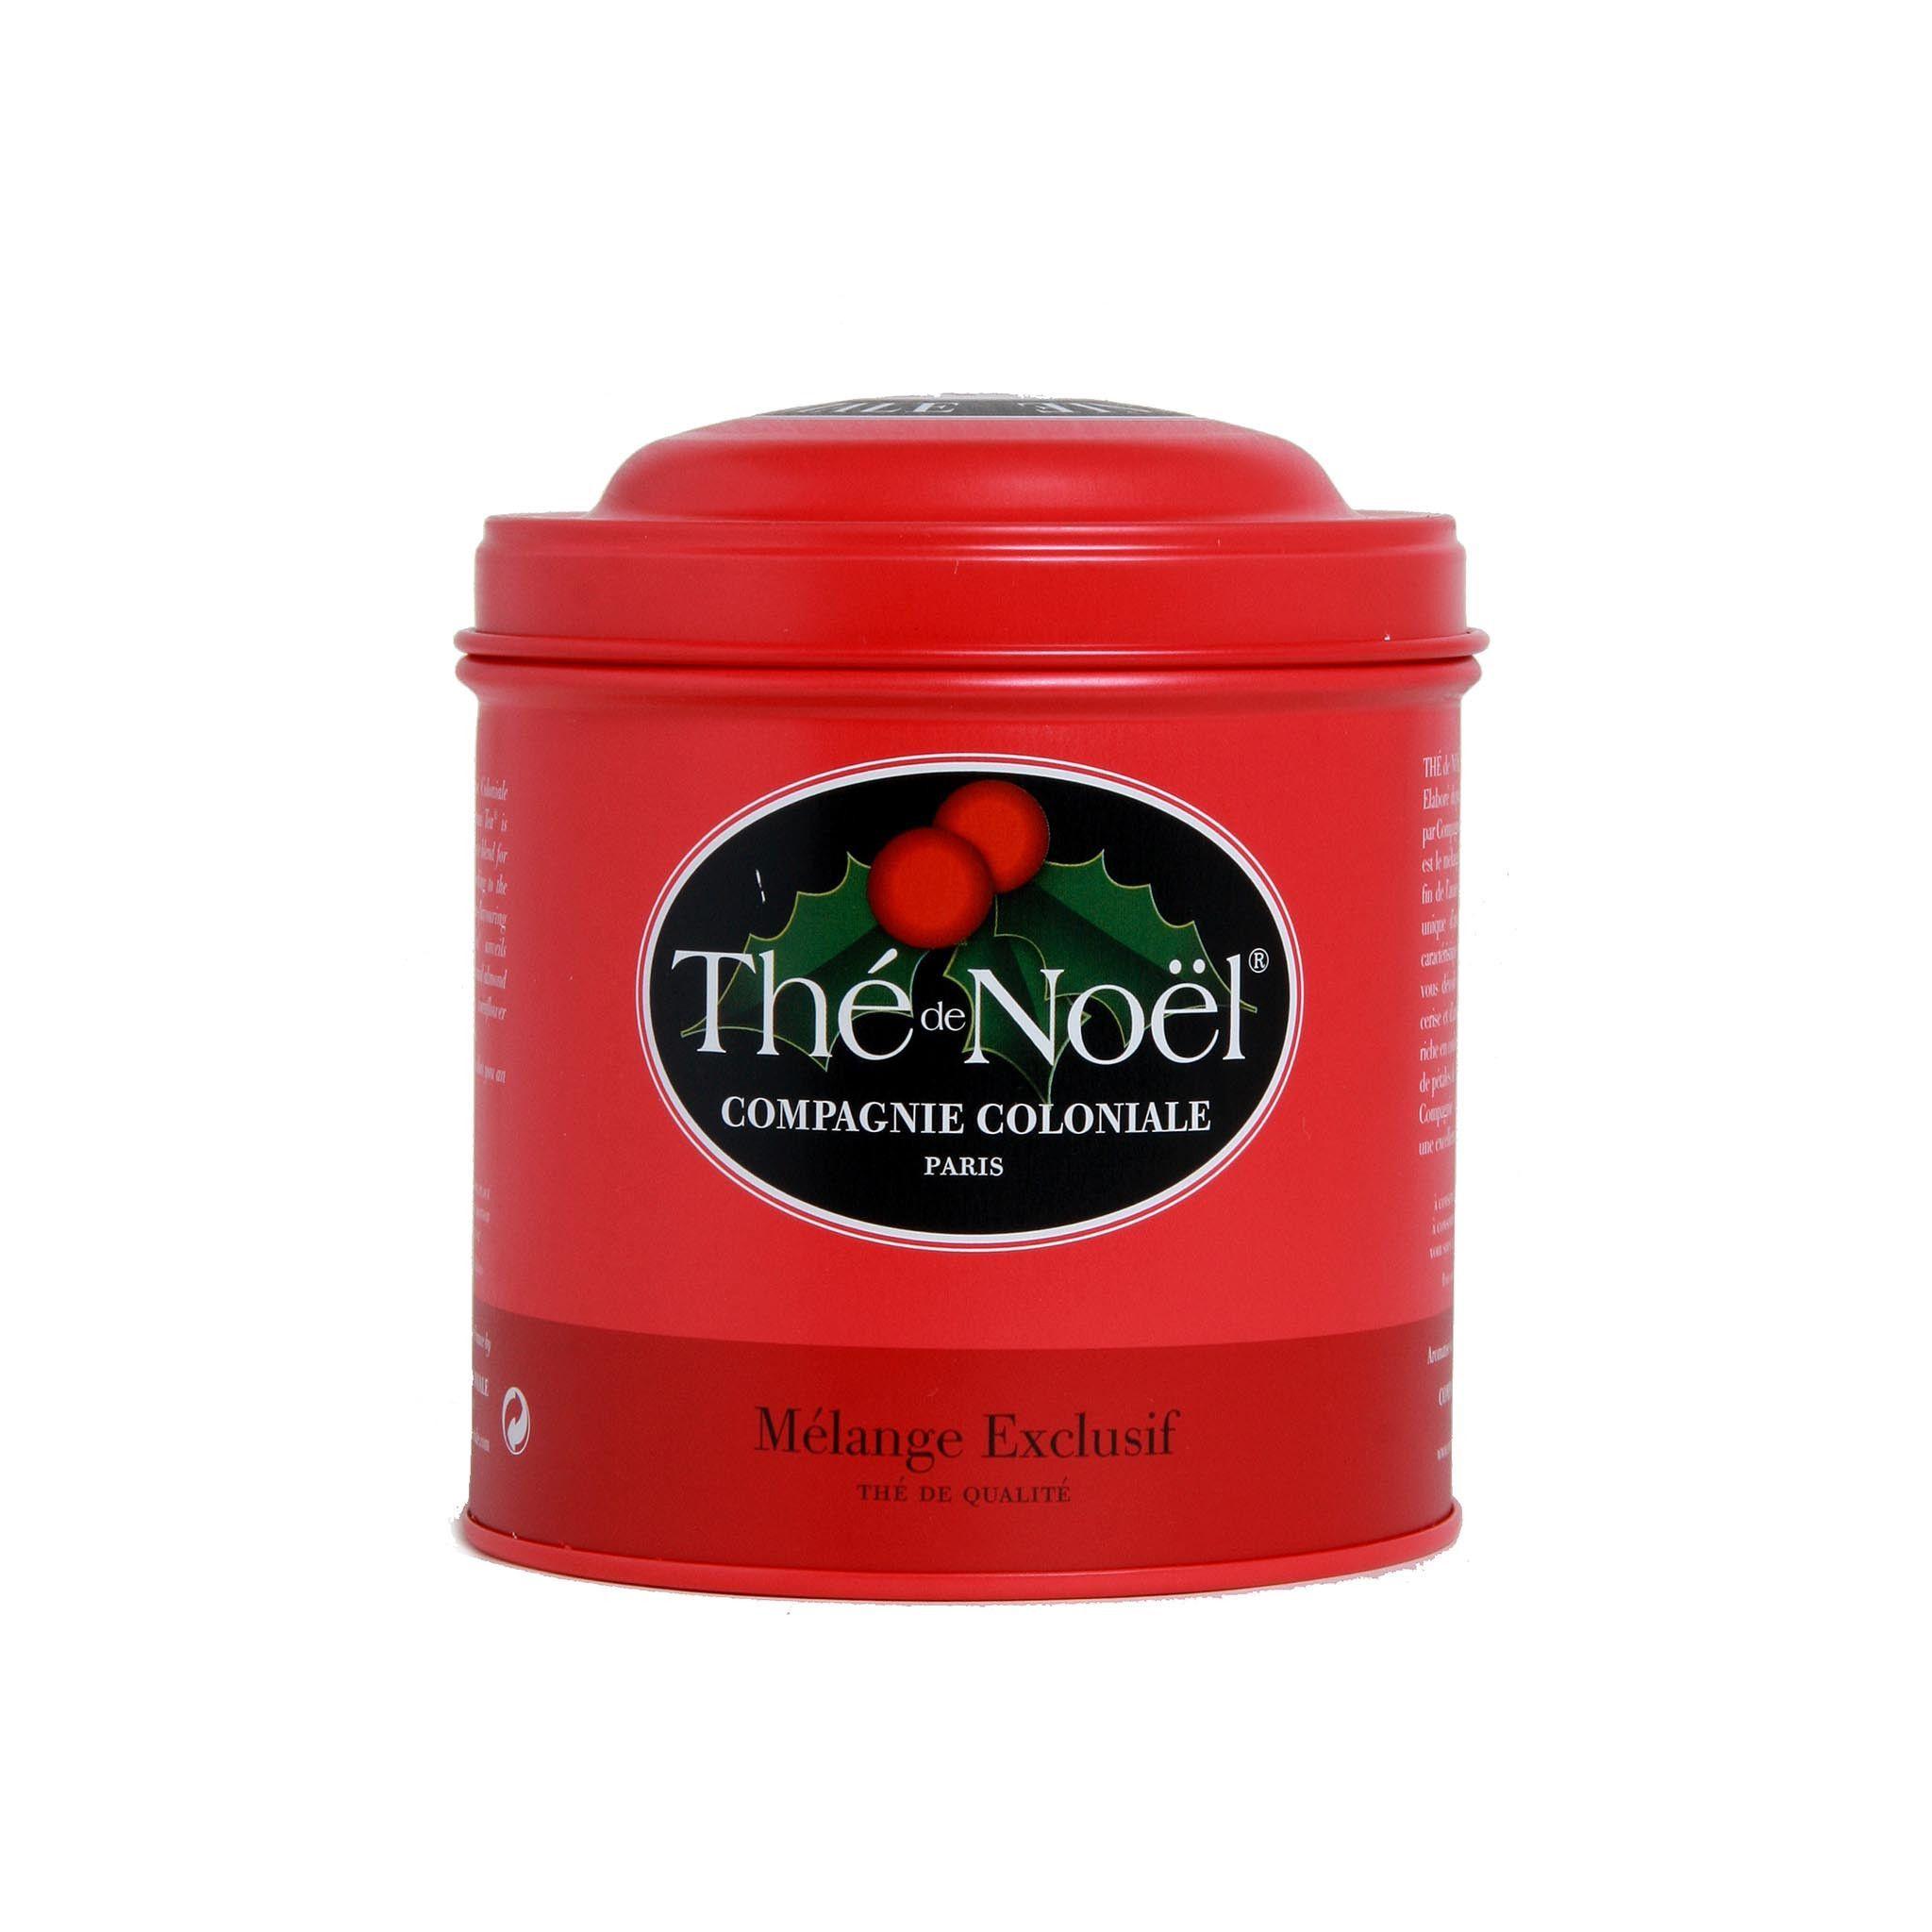 Christmas Tea - The de Noel